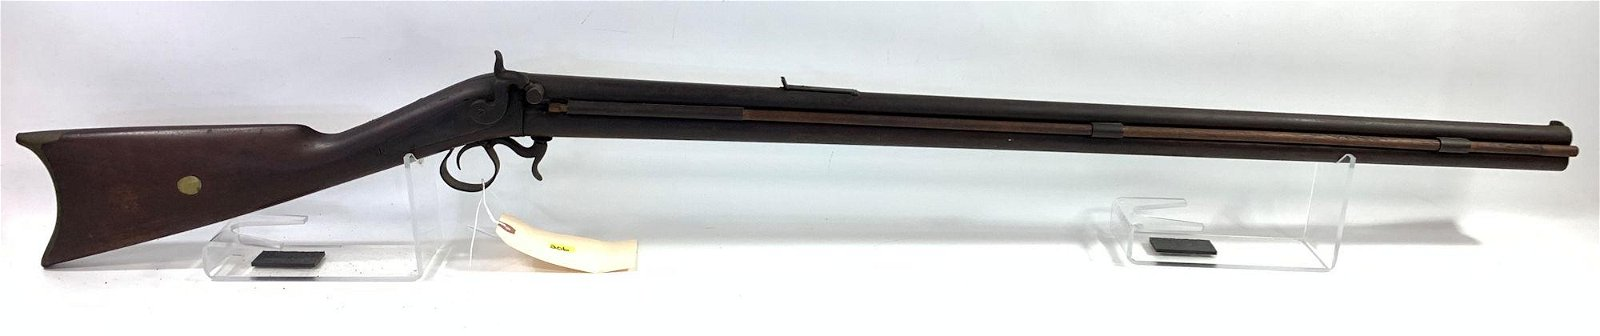 B. C. WOOD .12 GAUGE & .45 CALIBER RIFLE/SHOTGUN COMBO